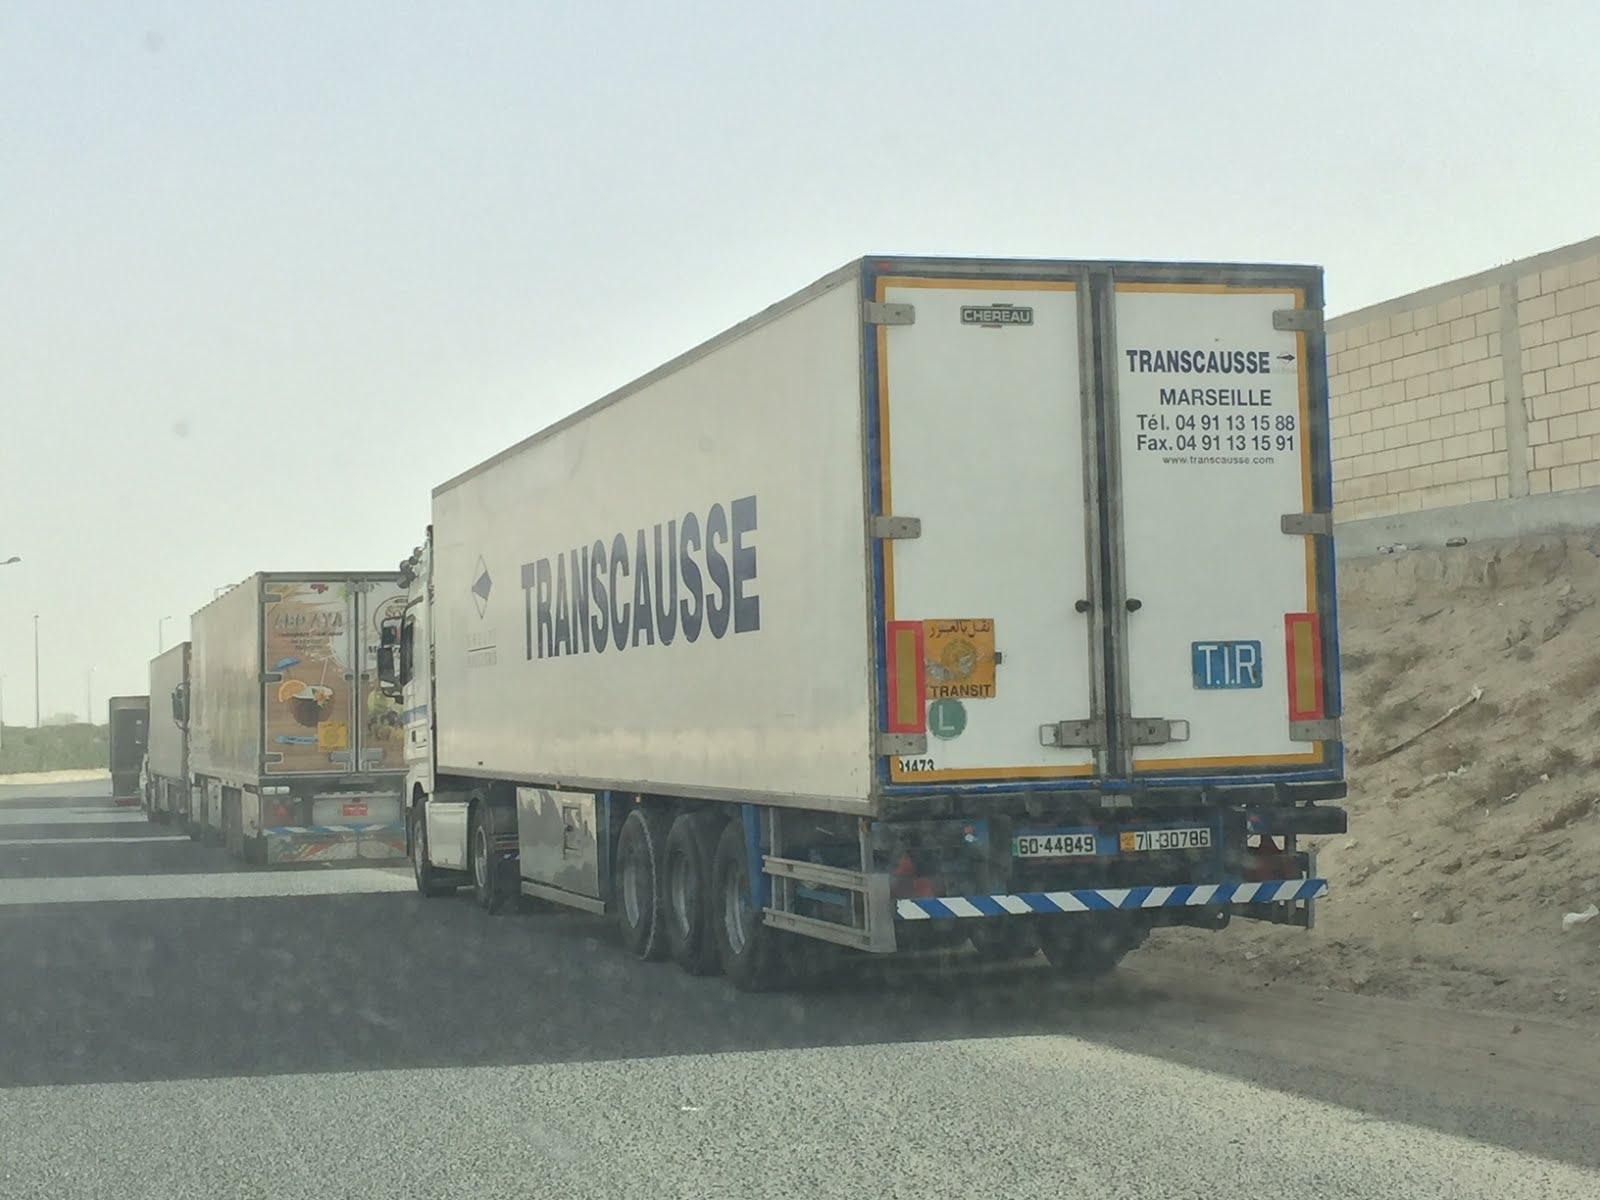 Jual Sisir 7vs Terbaru 2018 Tcash Vaganza 17 Botol Minum Olahraga Aluminium 750ml Biru Catatan Ardis Family Truk Buah Dan Sayur Di Kuwait Ini Dengan Plat Nomor Jerman